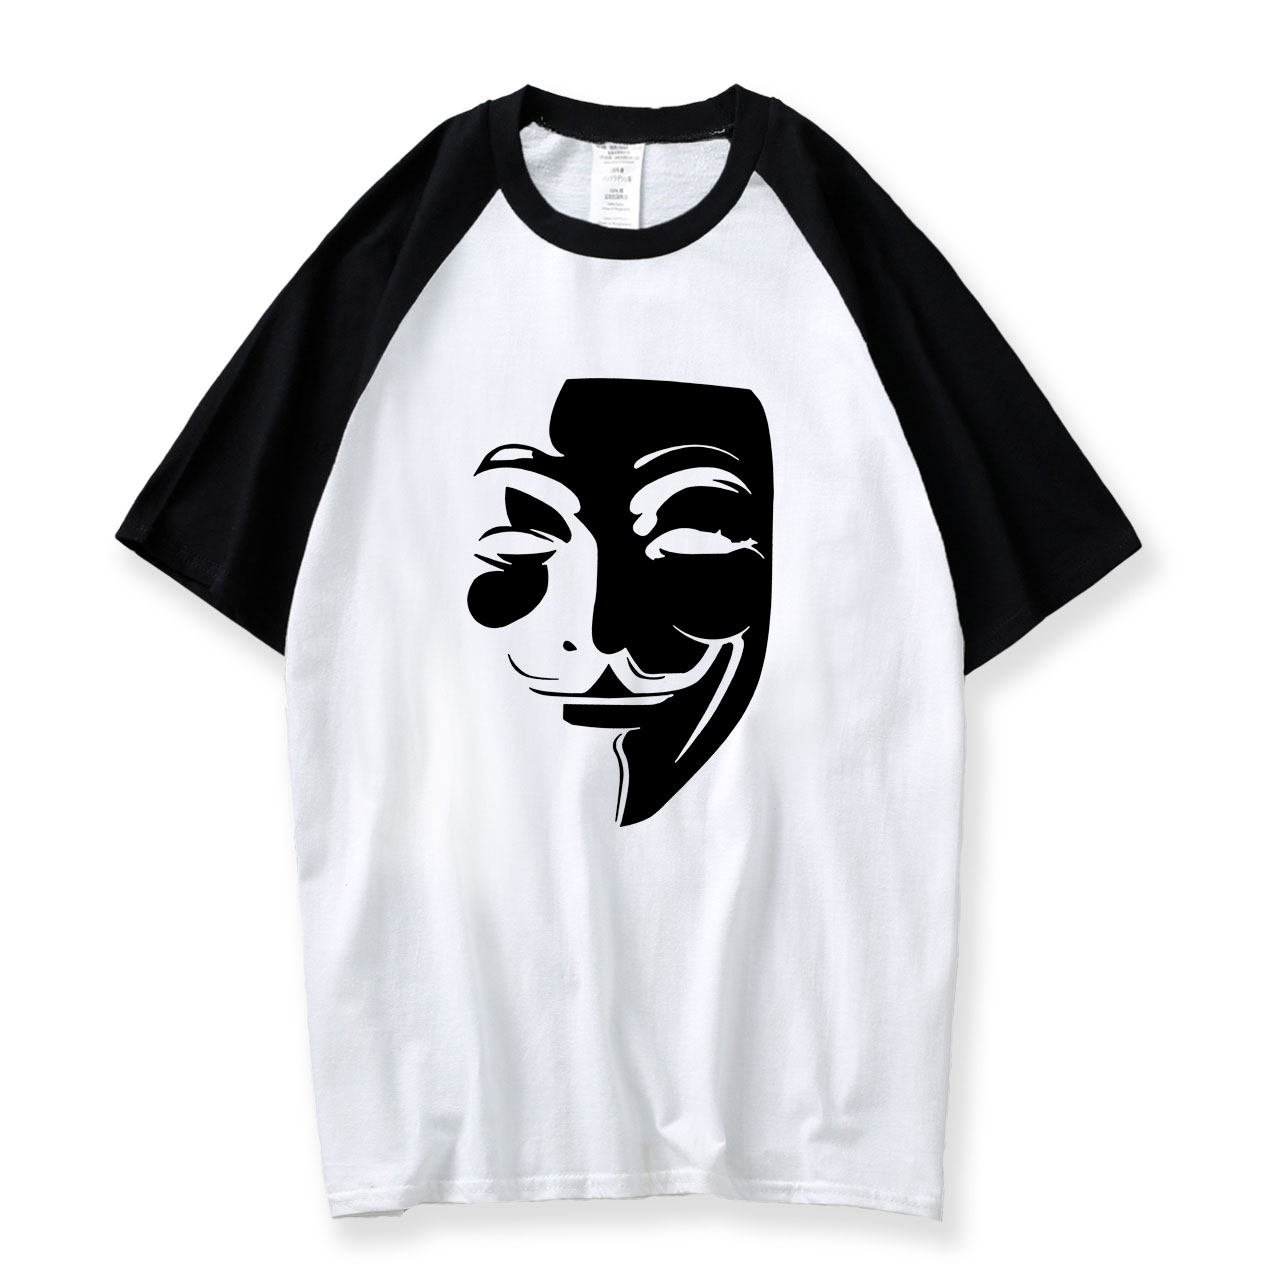 V for Vendetta Raglan Tee 2018 Summer New Style Simple Casual Loose Printed T Shirt Boyfriend Men 100% Cotton O Neck Mens Tshirt